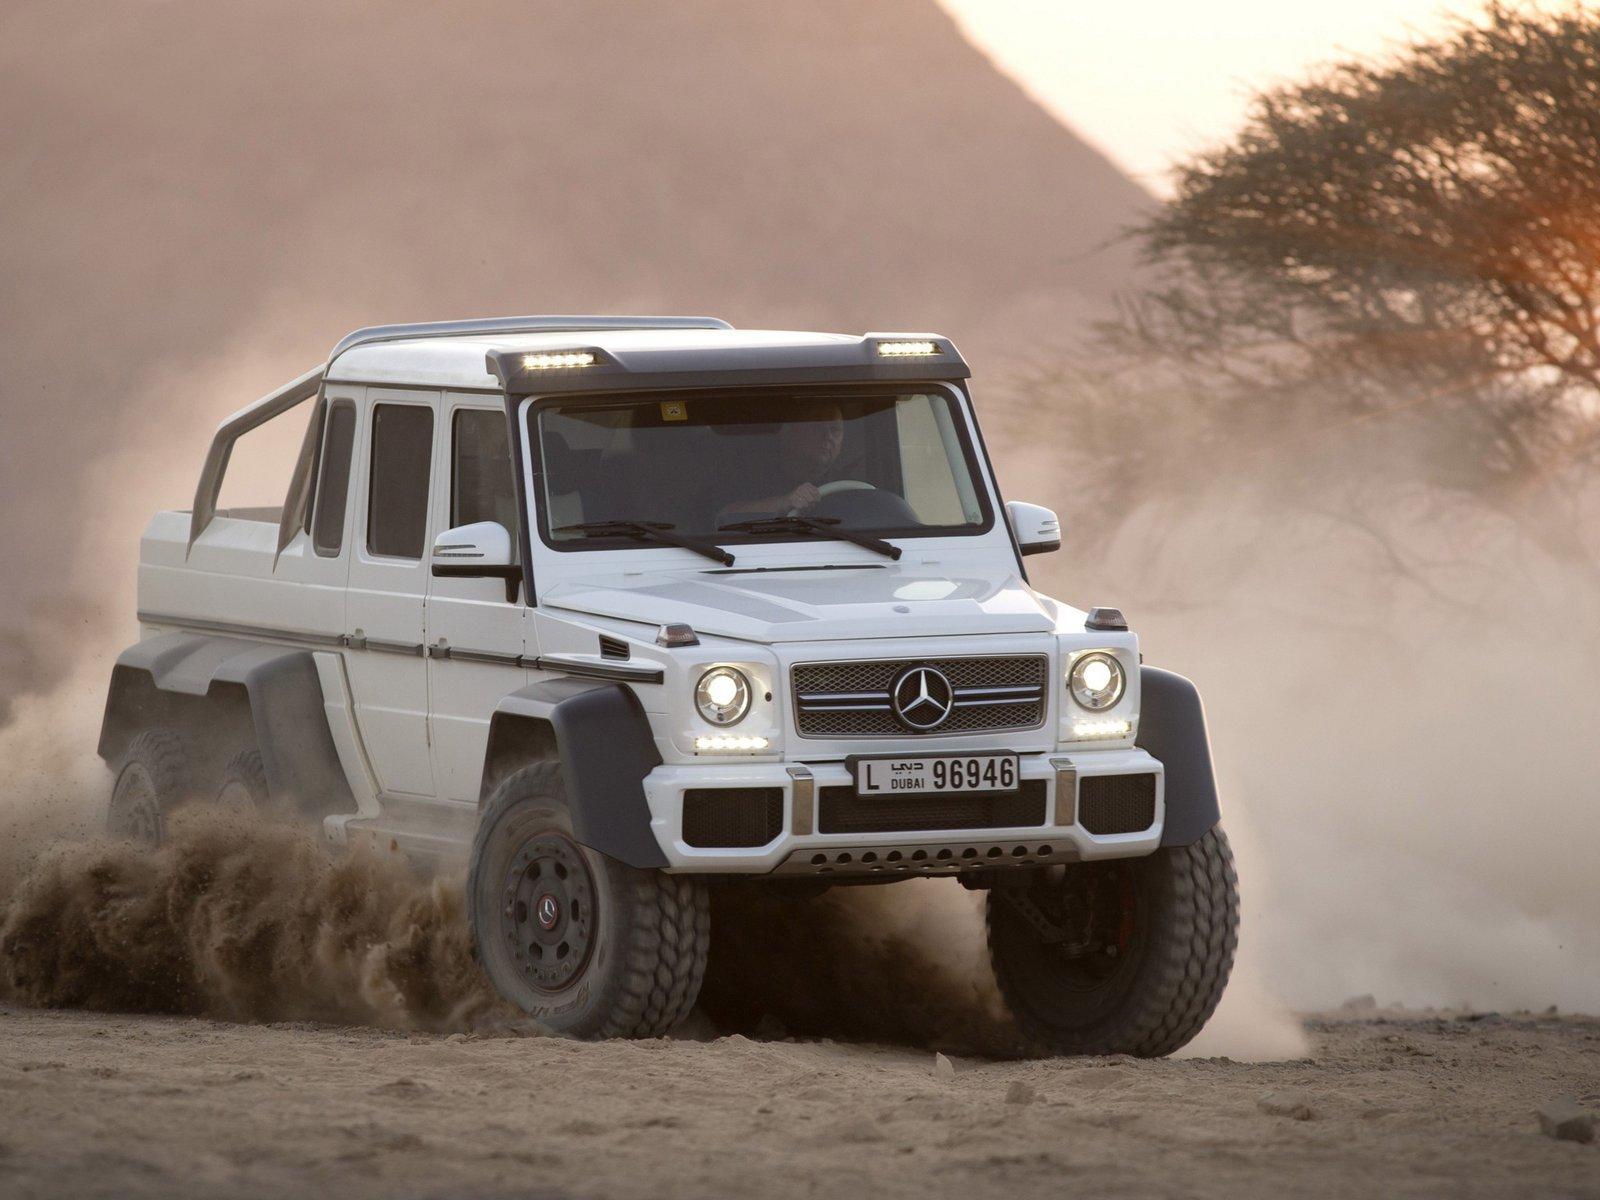 Armored Mercedes Benz G63 Amg 6x6 To Cost 1 3 Million Gtspirit